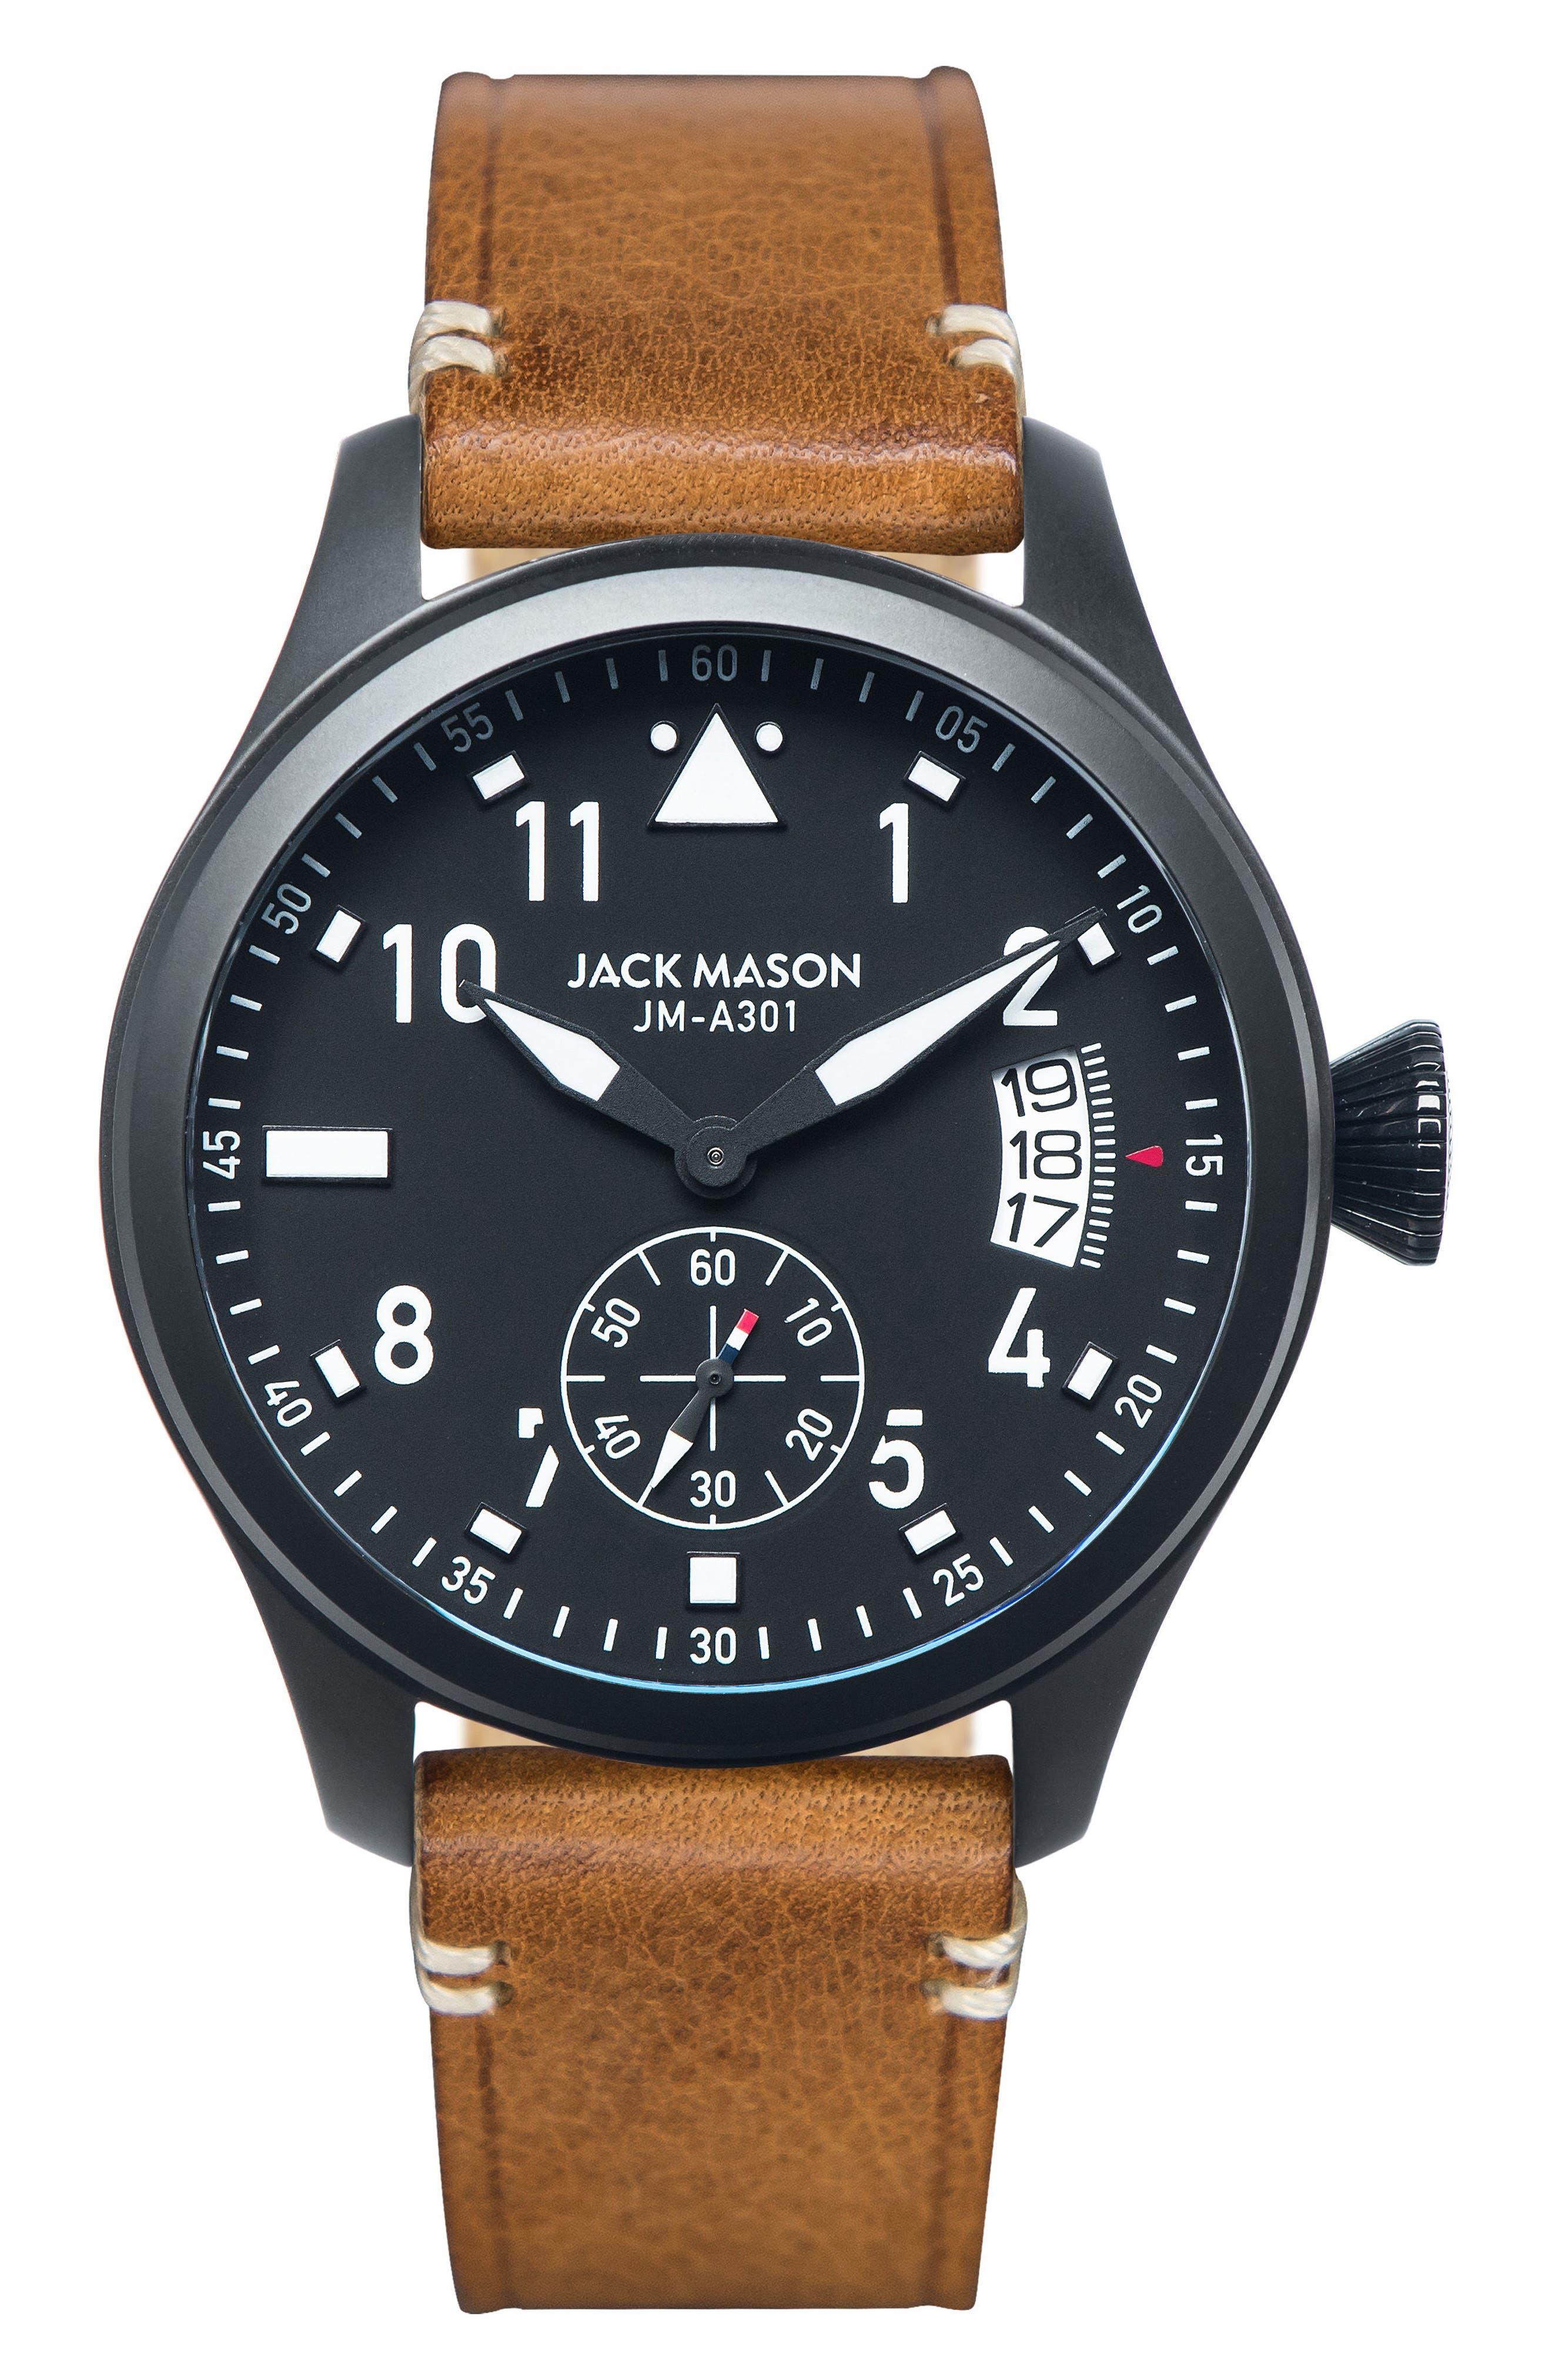 JACK MASON AVIATION LEATHER STRAP WATCH, 45MM